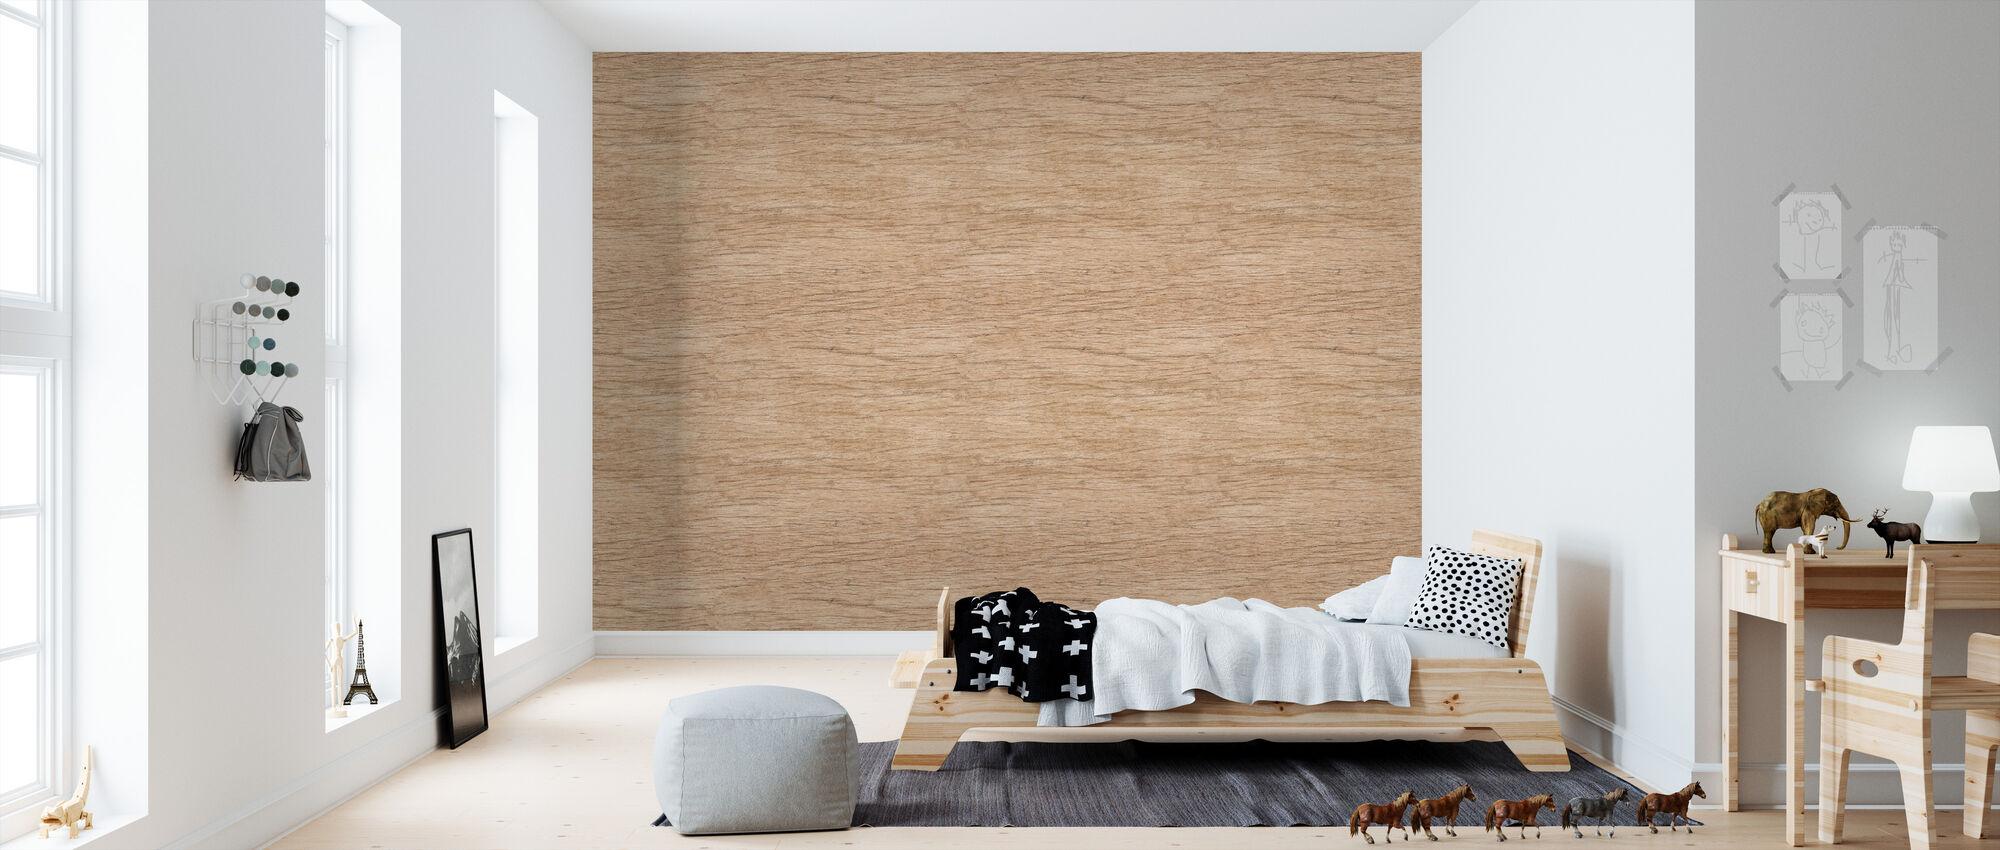 Baan Tawai Wood Texture - Wallpaper - Kids Room